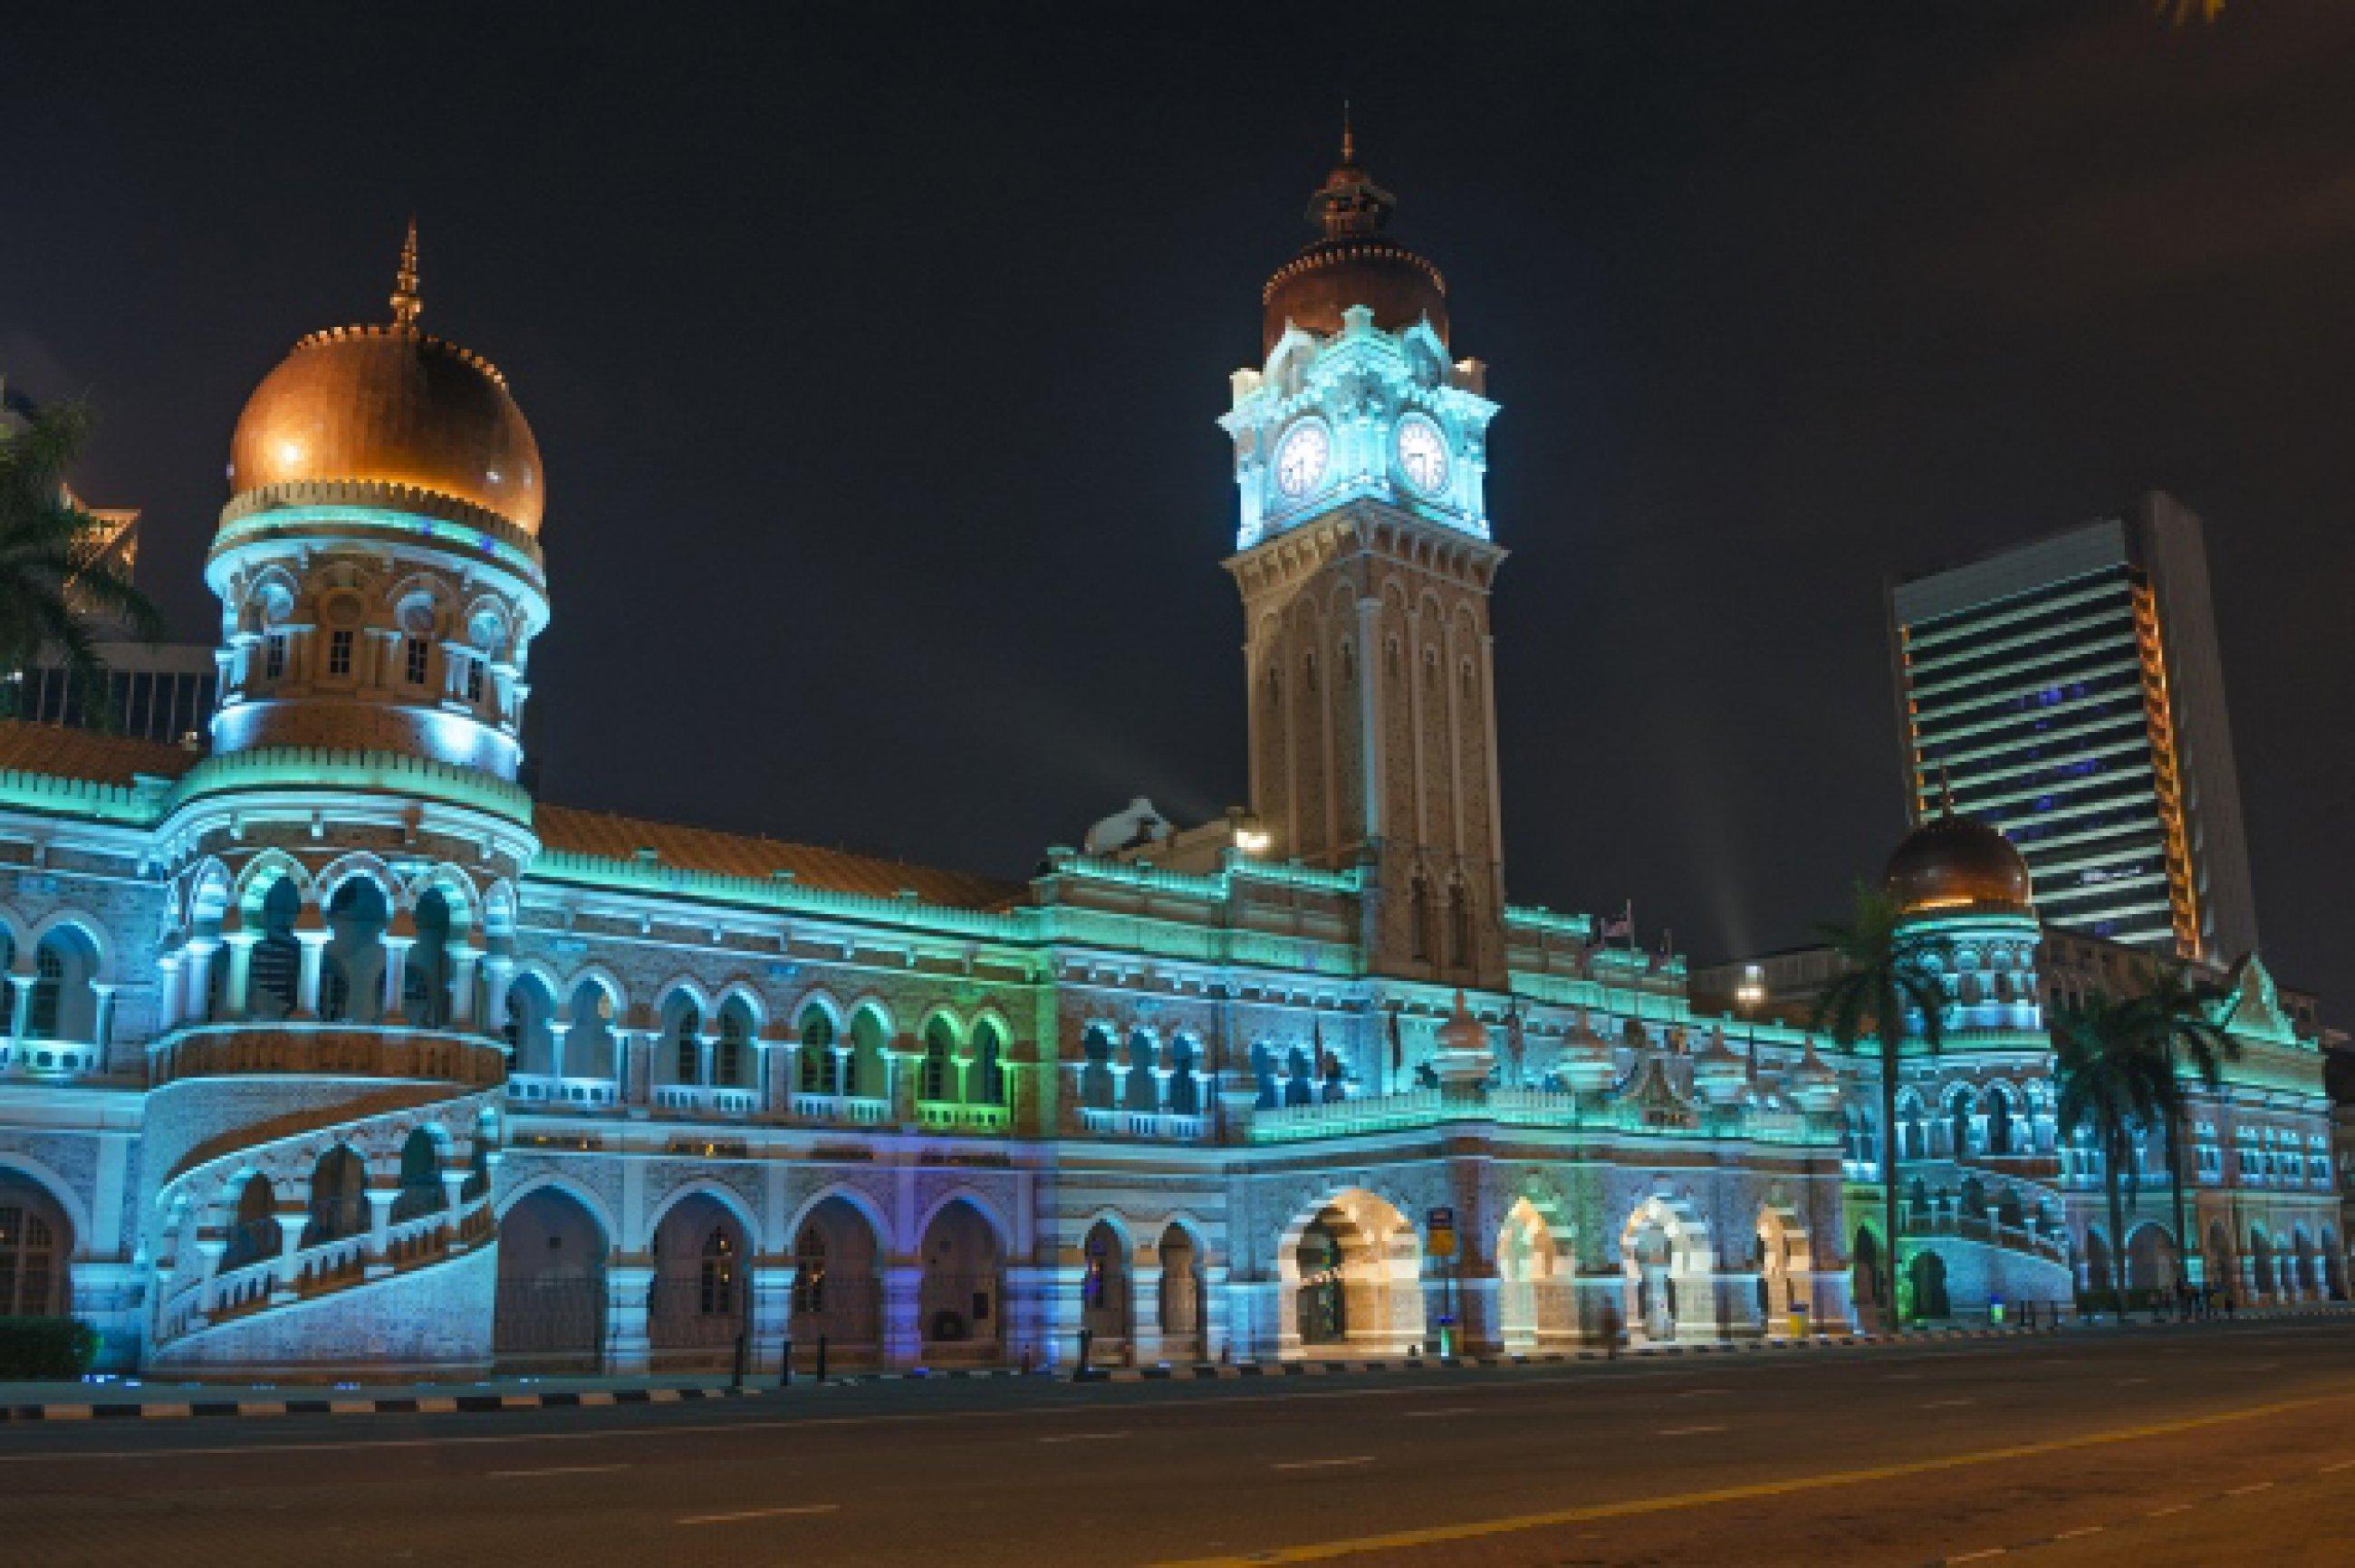 https://bubo.sk/uploads/galleries/8377/architecture-in-central-kuala-lumpur-malaysia-kopia.jpg